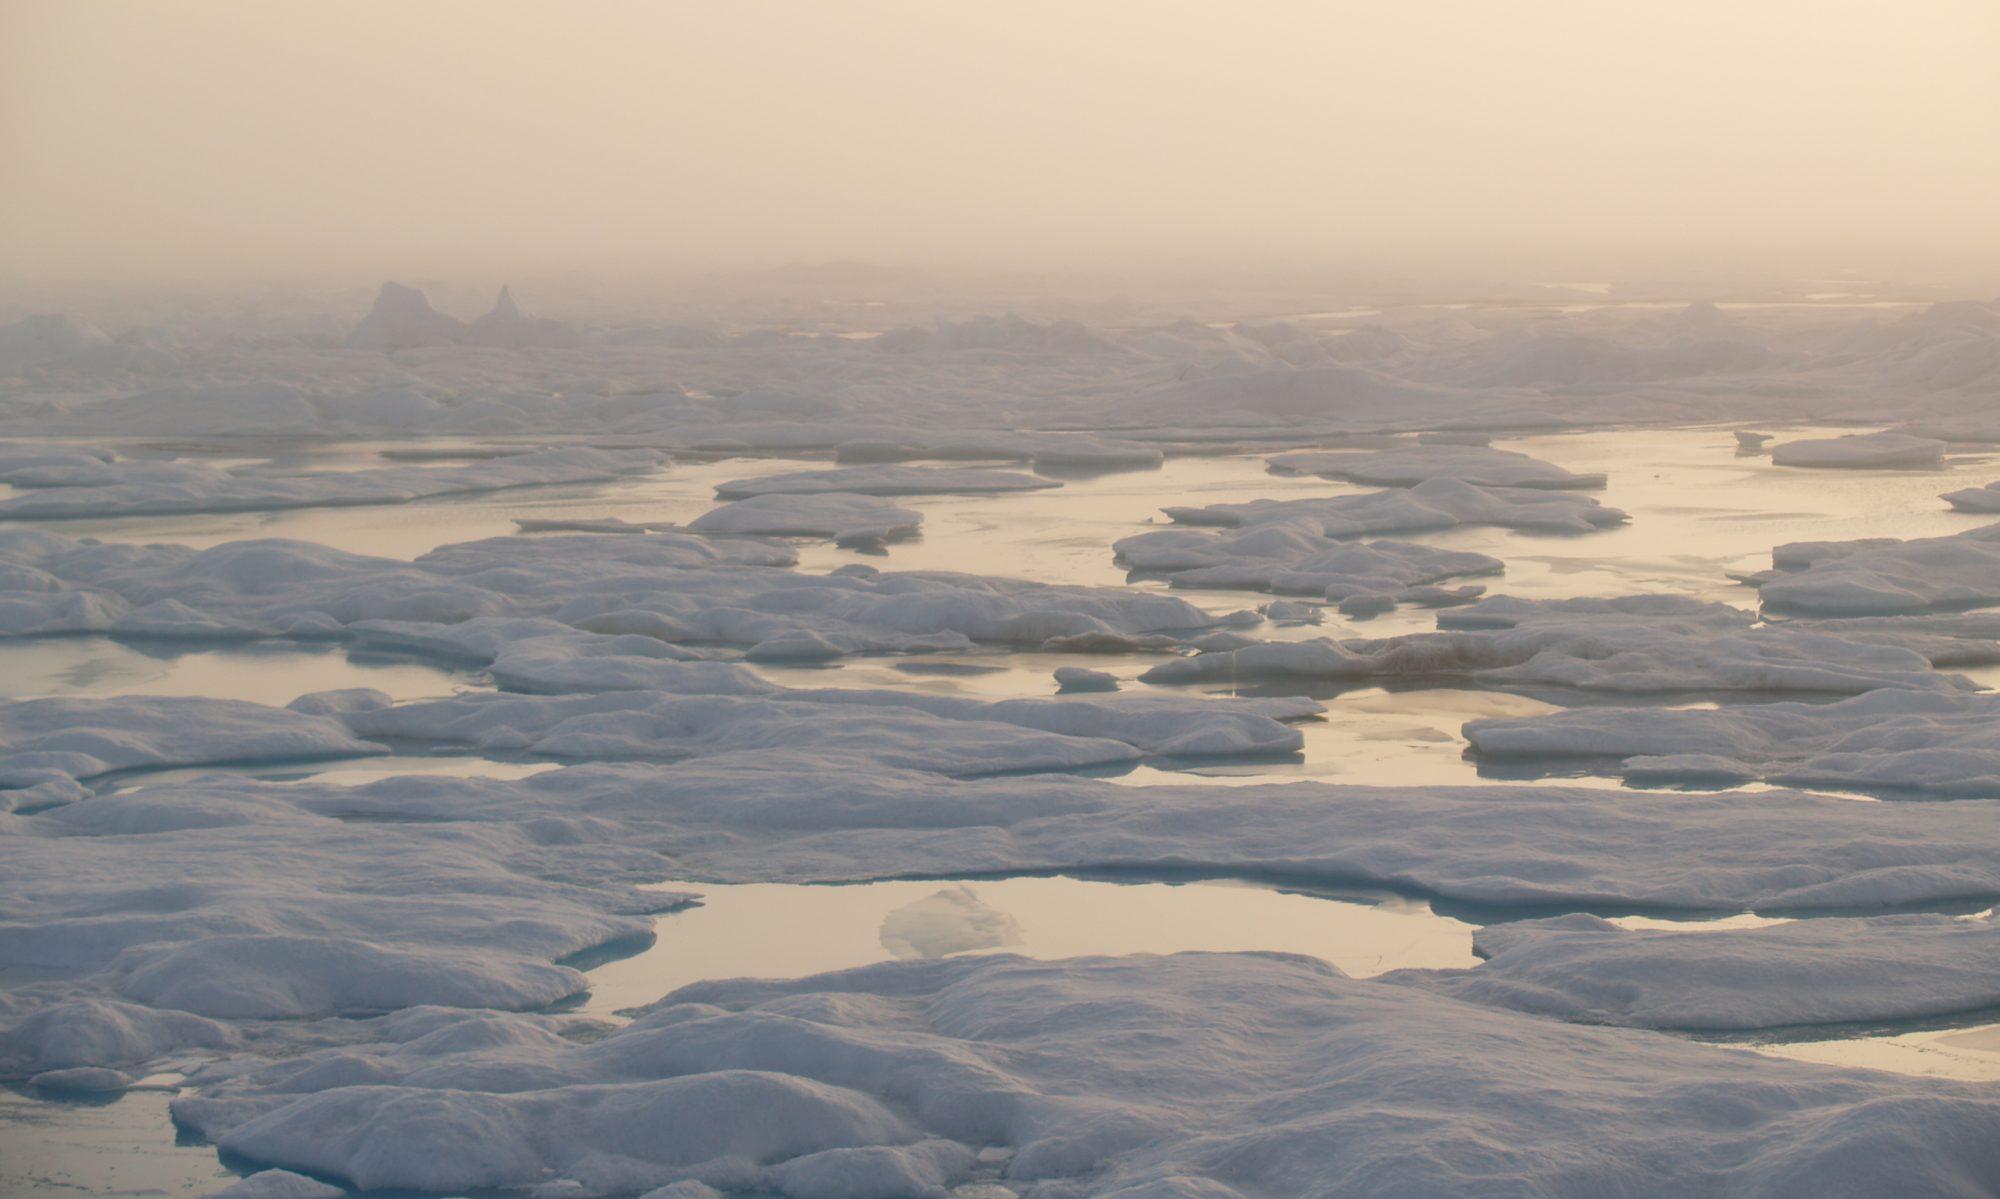 Siku: Sea Ice Discrete Element Method Model